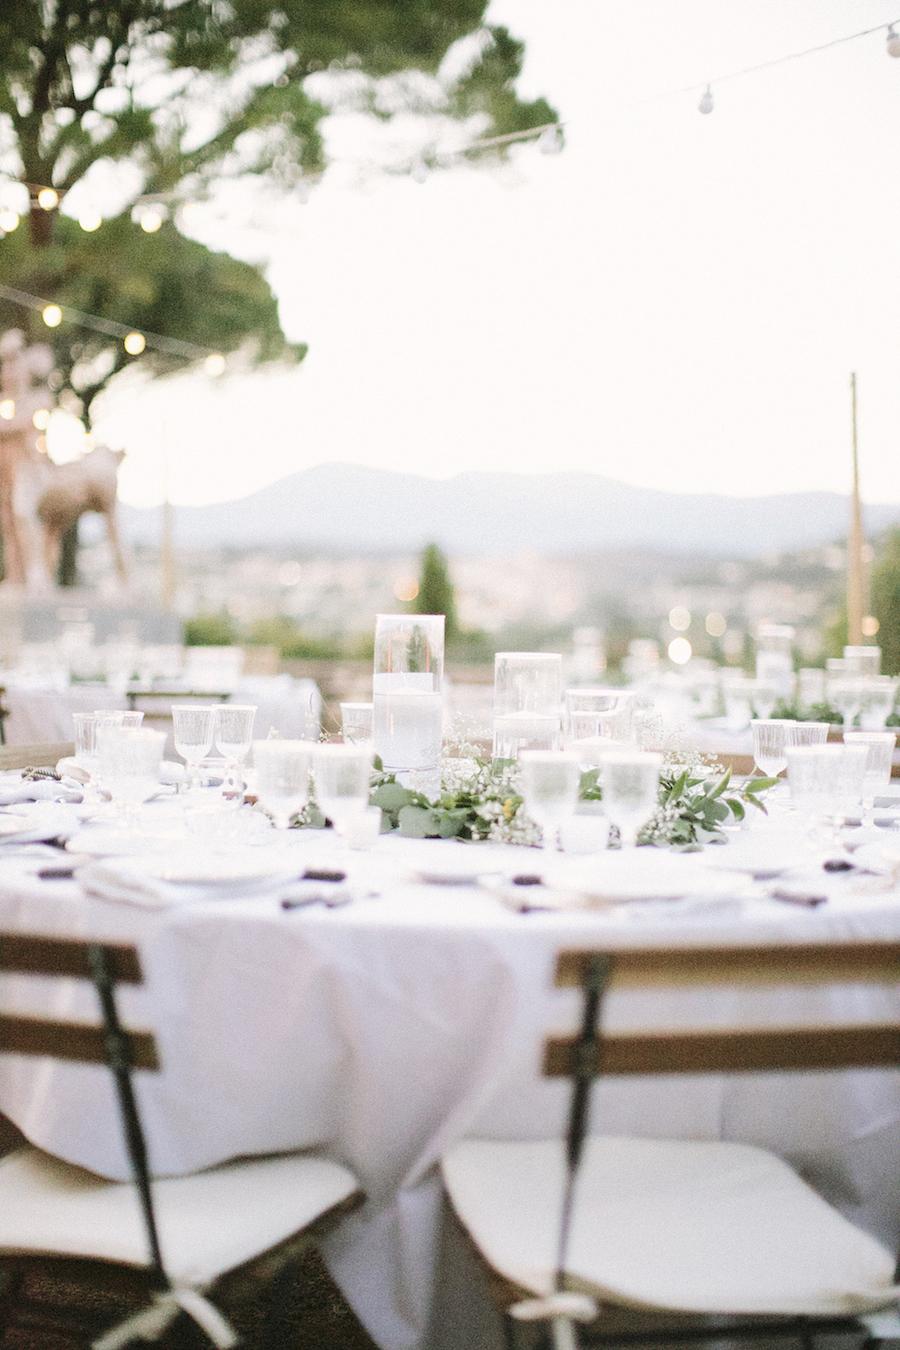 saya-photography-wedding-french-riviera-rustic-antibes-la-bastide-du-roy-114.jpg